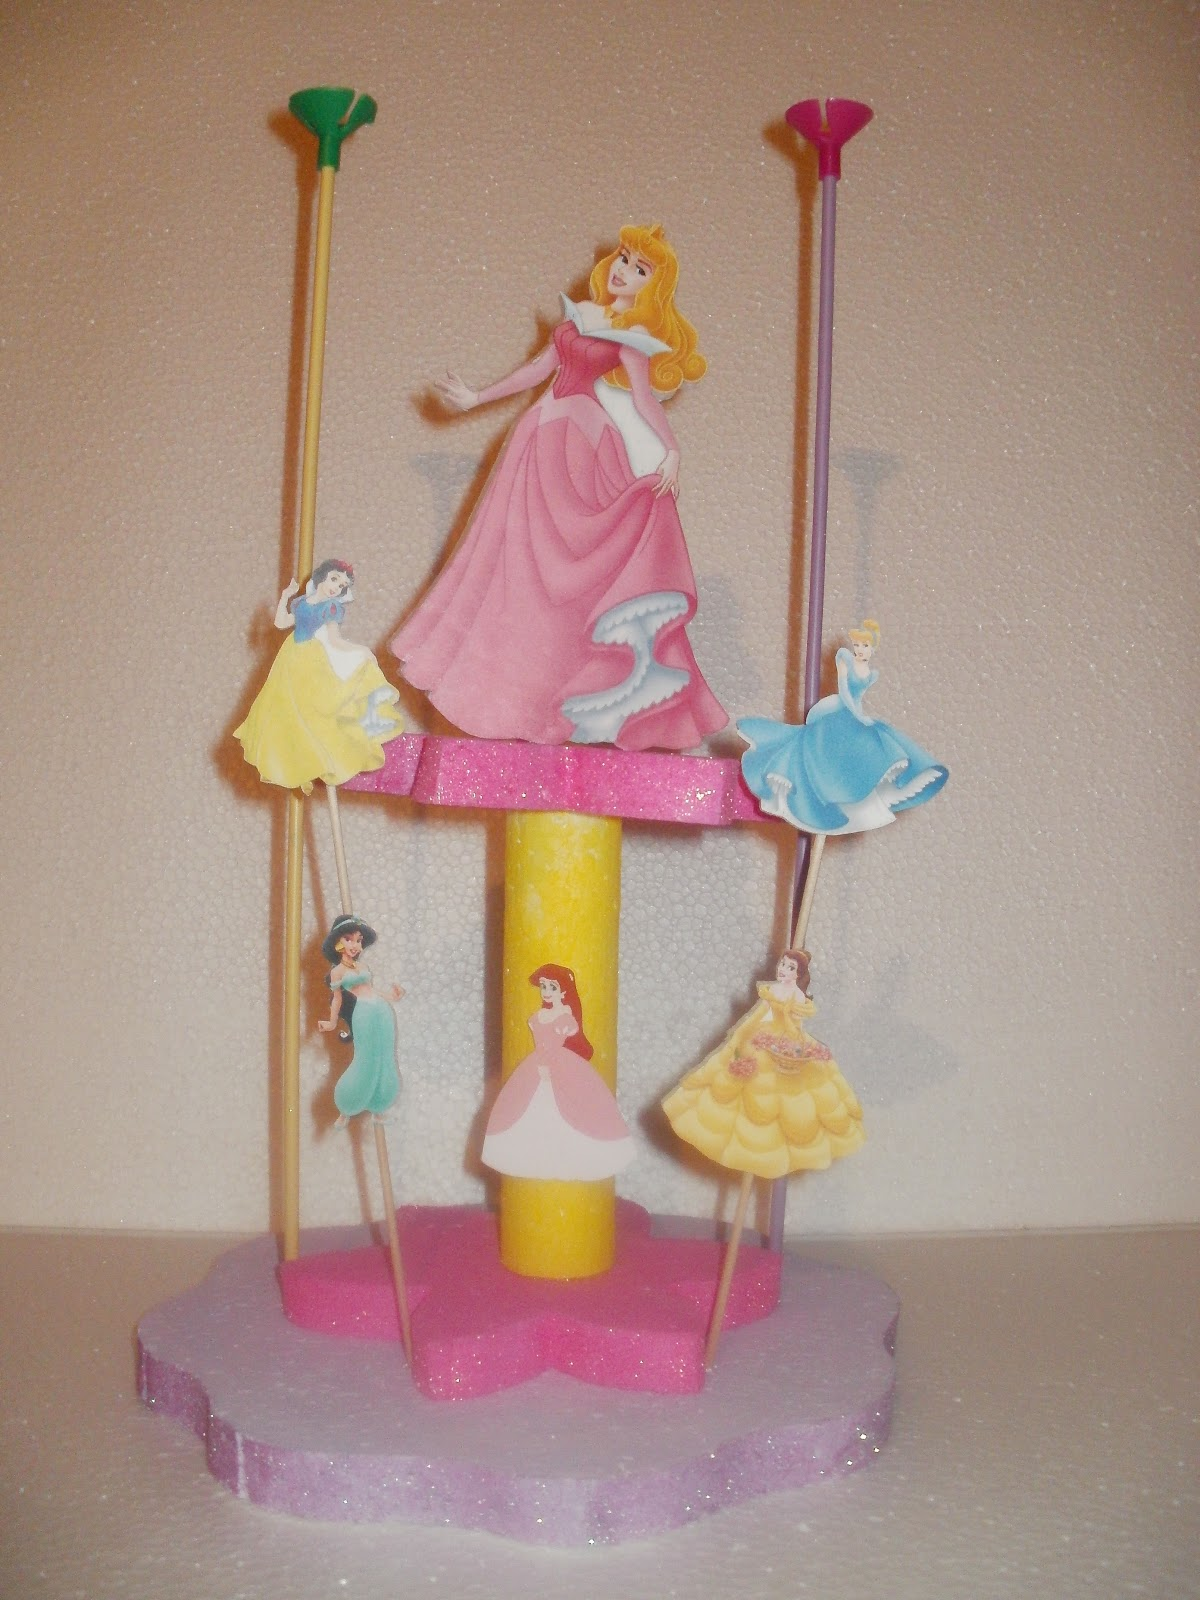 O c cotill n artesanal princesas disney - Mesas infantiles disney ...